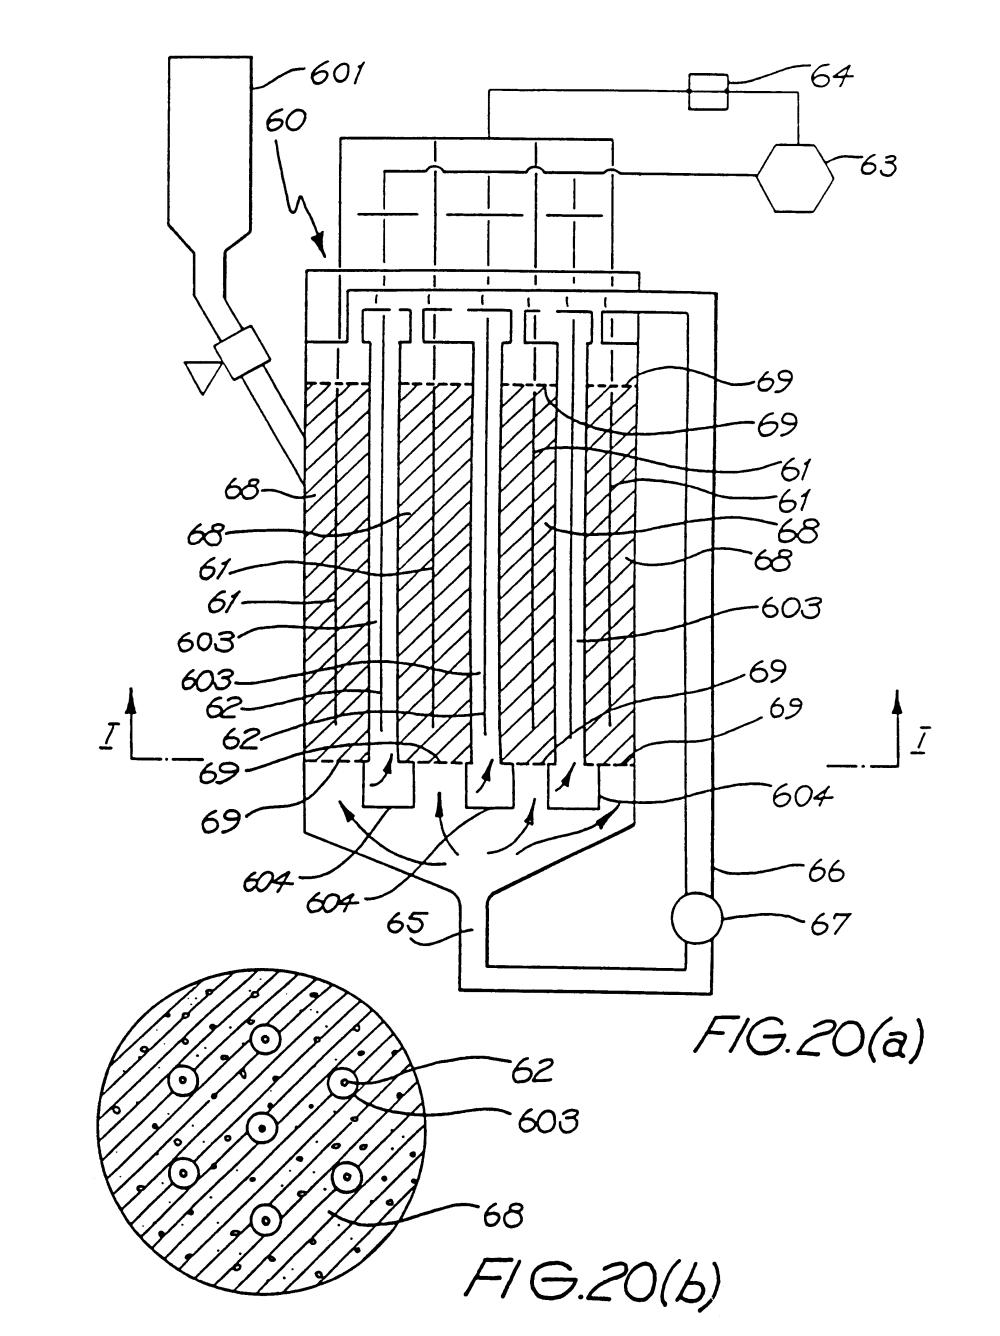 medium resolution of toyota 7 pin wiring diagram wiring library rh 29 skriptoase de 7 pin trailer wiring diagram toyota tundra 7 pin trailer wiring diagram